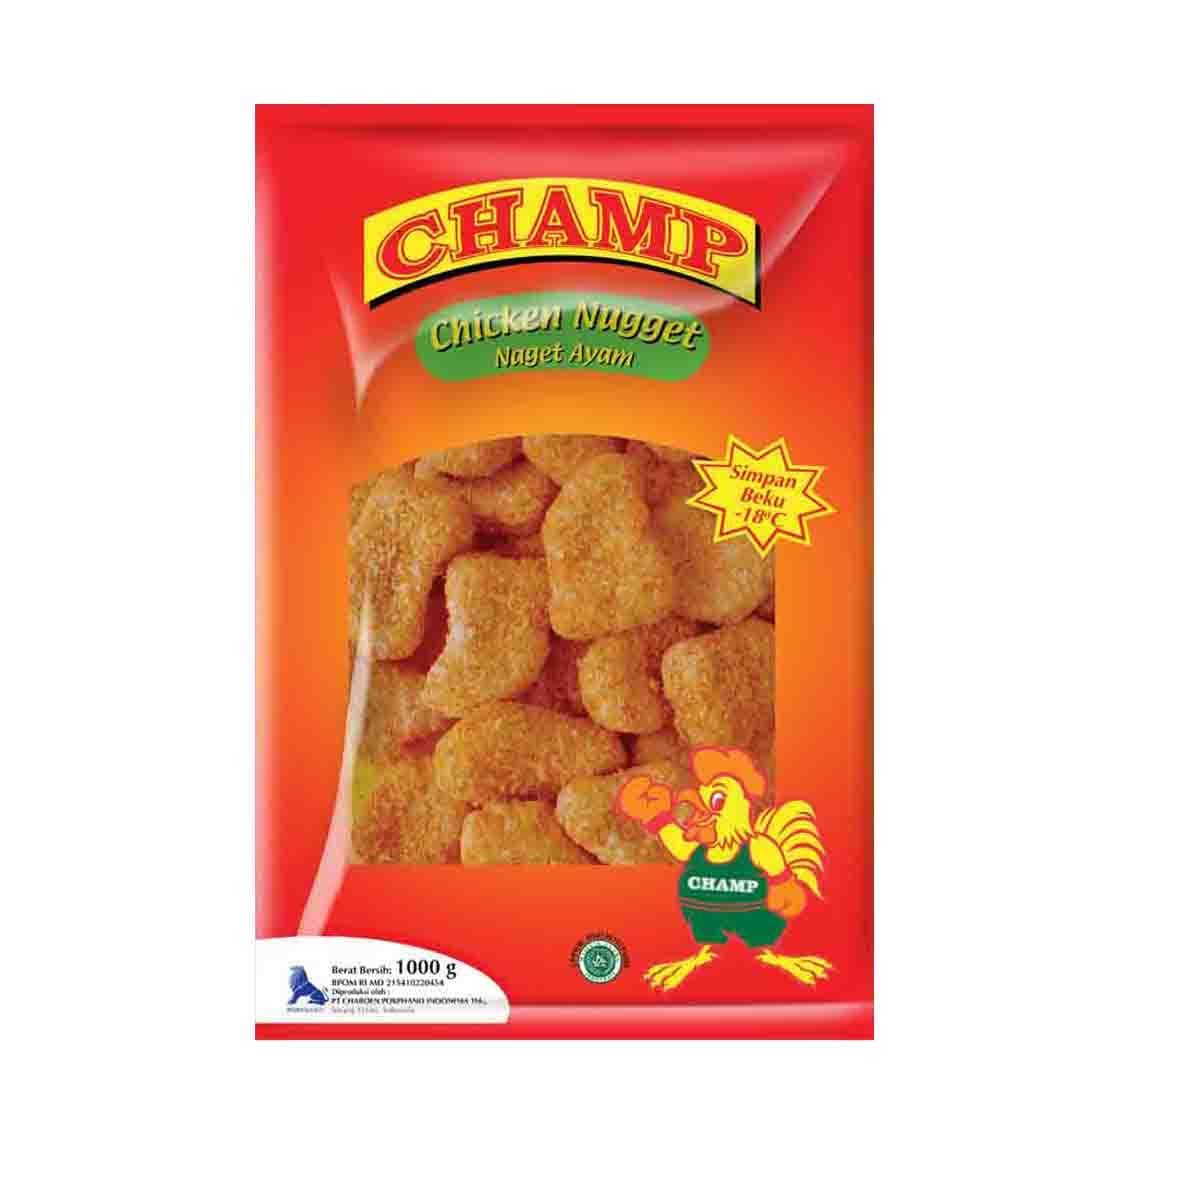 Champ Paket Nugget Makanan Instan 1000 G (2 Pcs) - Blanja.com